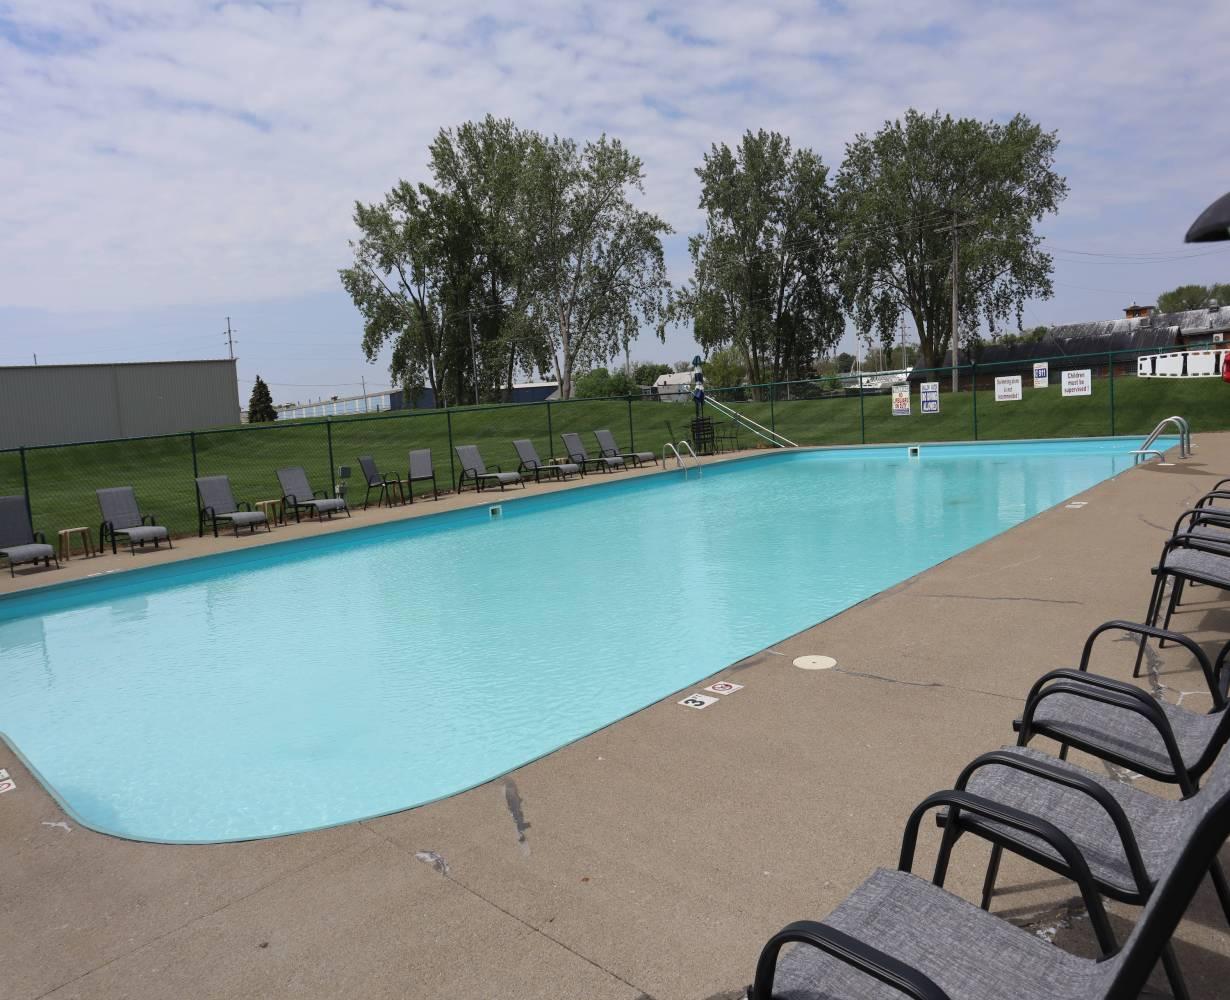 son-rise-marina-sandusky-ohio-gallery-pool-6